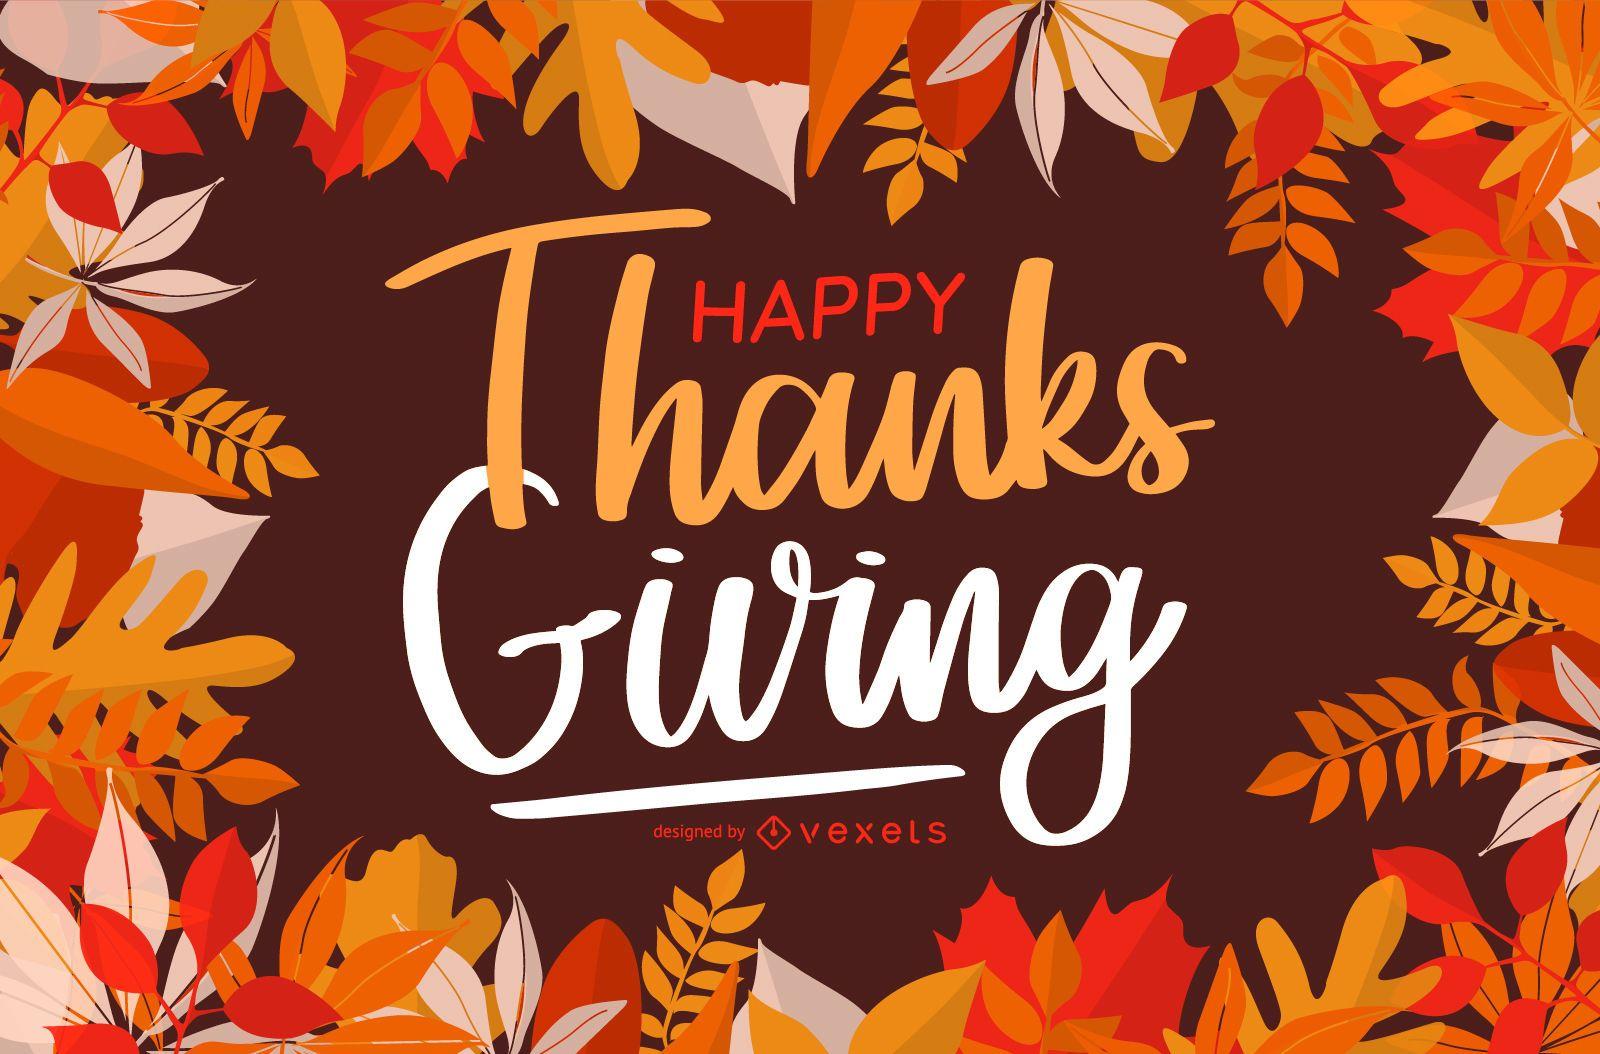 Happy Thanksgiving Greeting Card Design